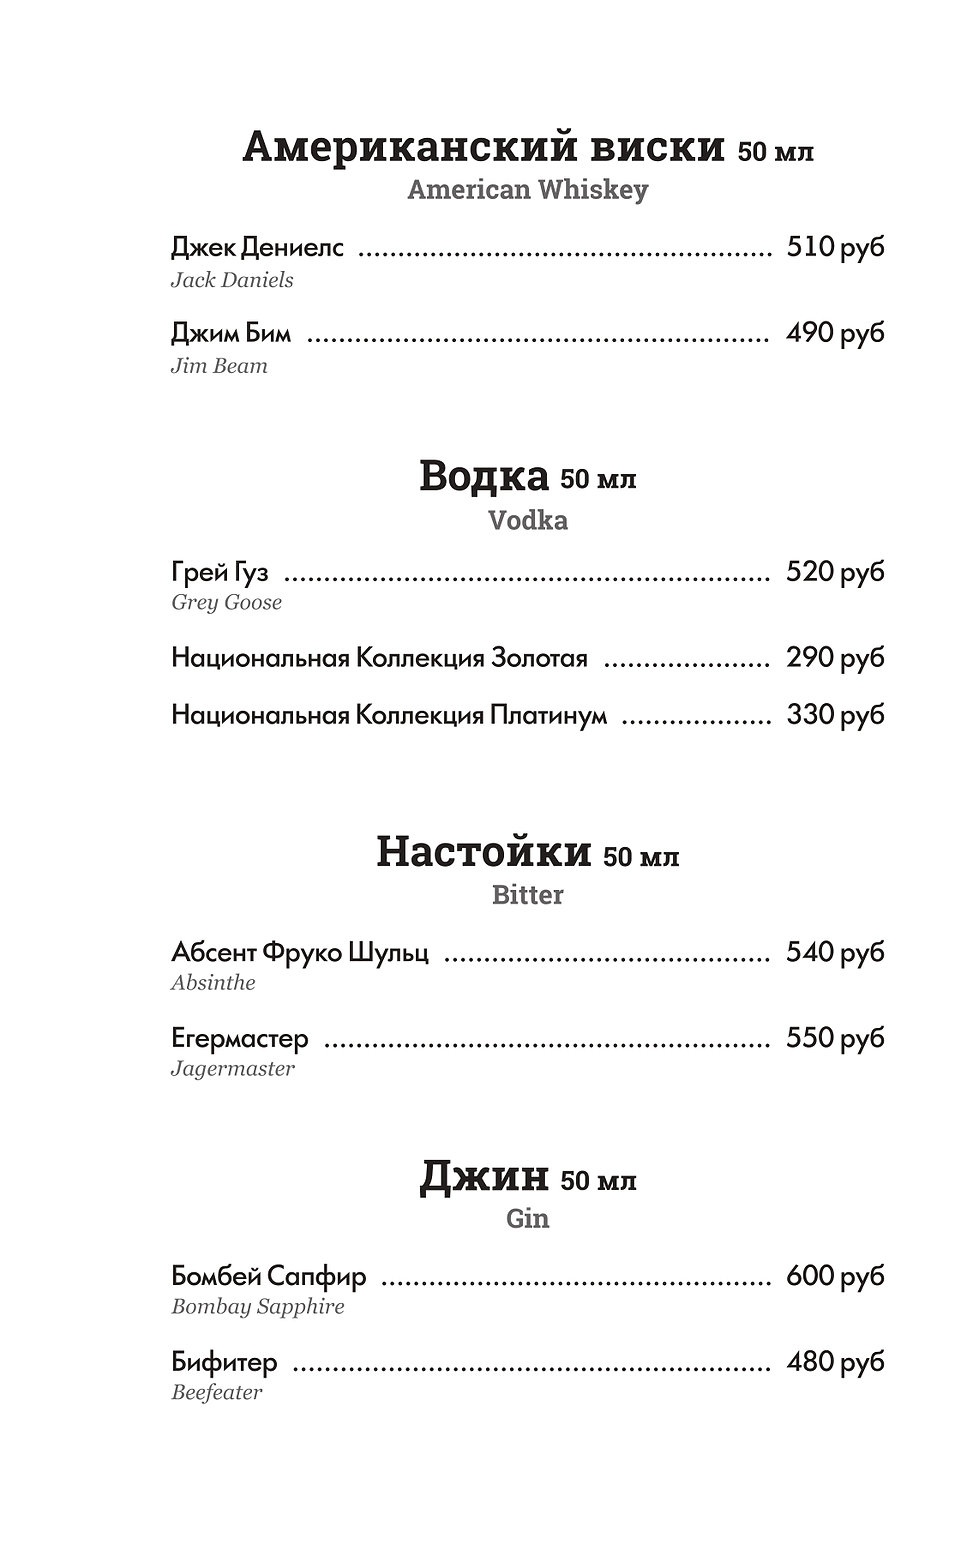 S46_bar_2021_ (2)_page-0011.jpg